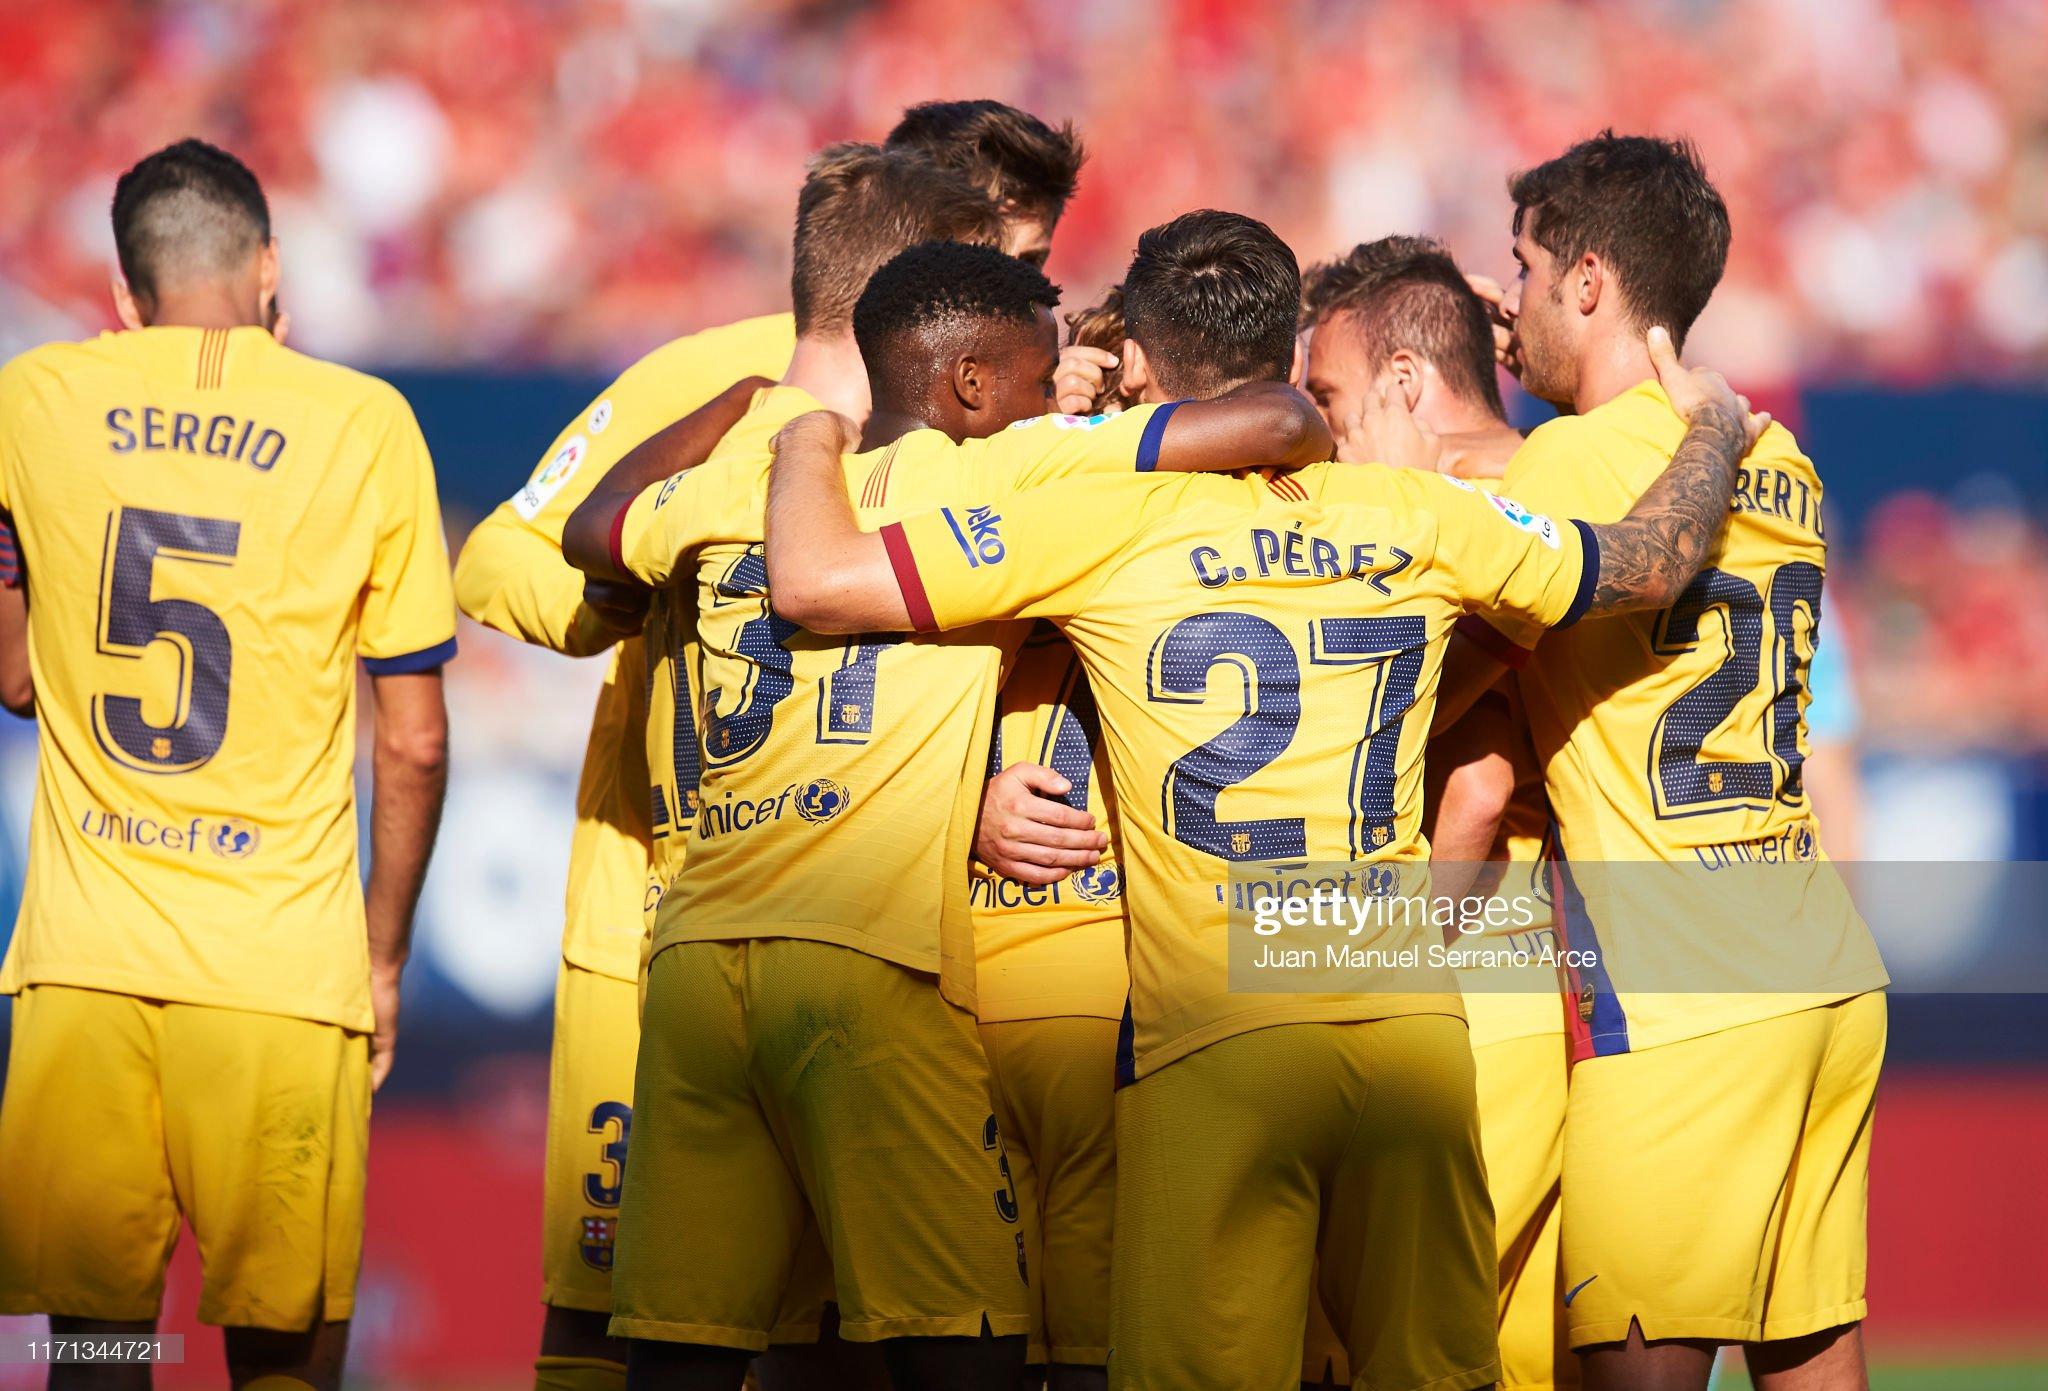 صور مباراة : أوساسونا - برشلونة 2-2 ( 31-08-2019 )  Arthur-melo-of-fc-barcelona-celebrates-with-teammates-after-scoring-picture-id1171344721?s=2048x2048